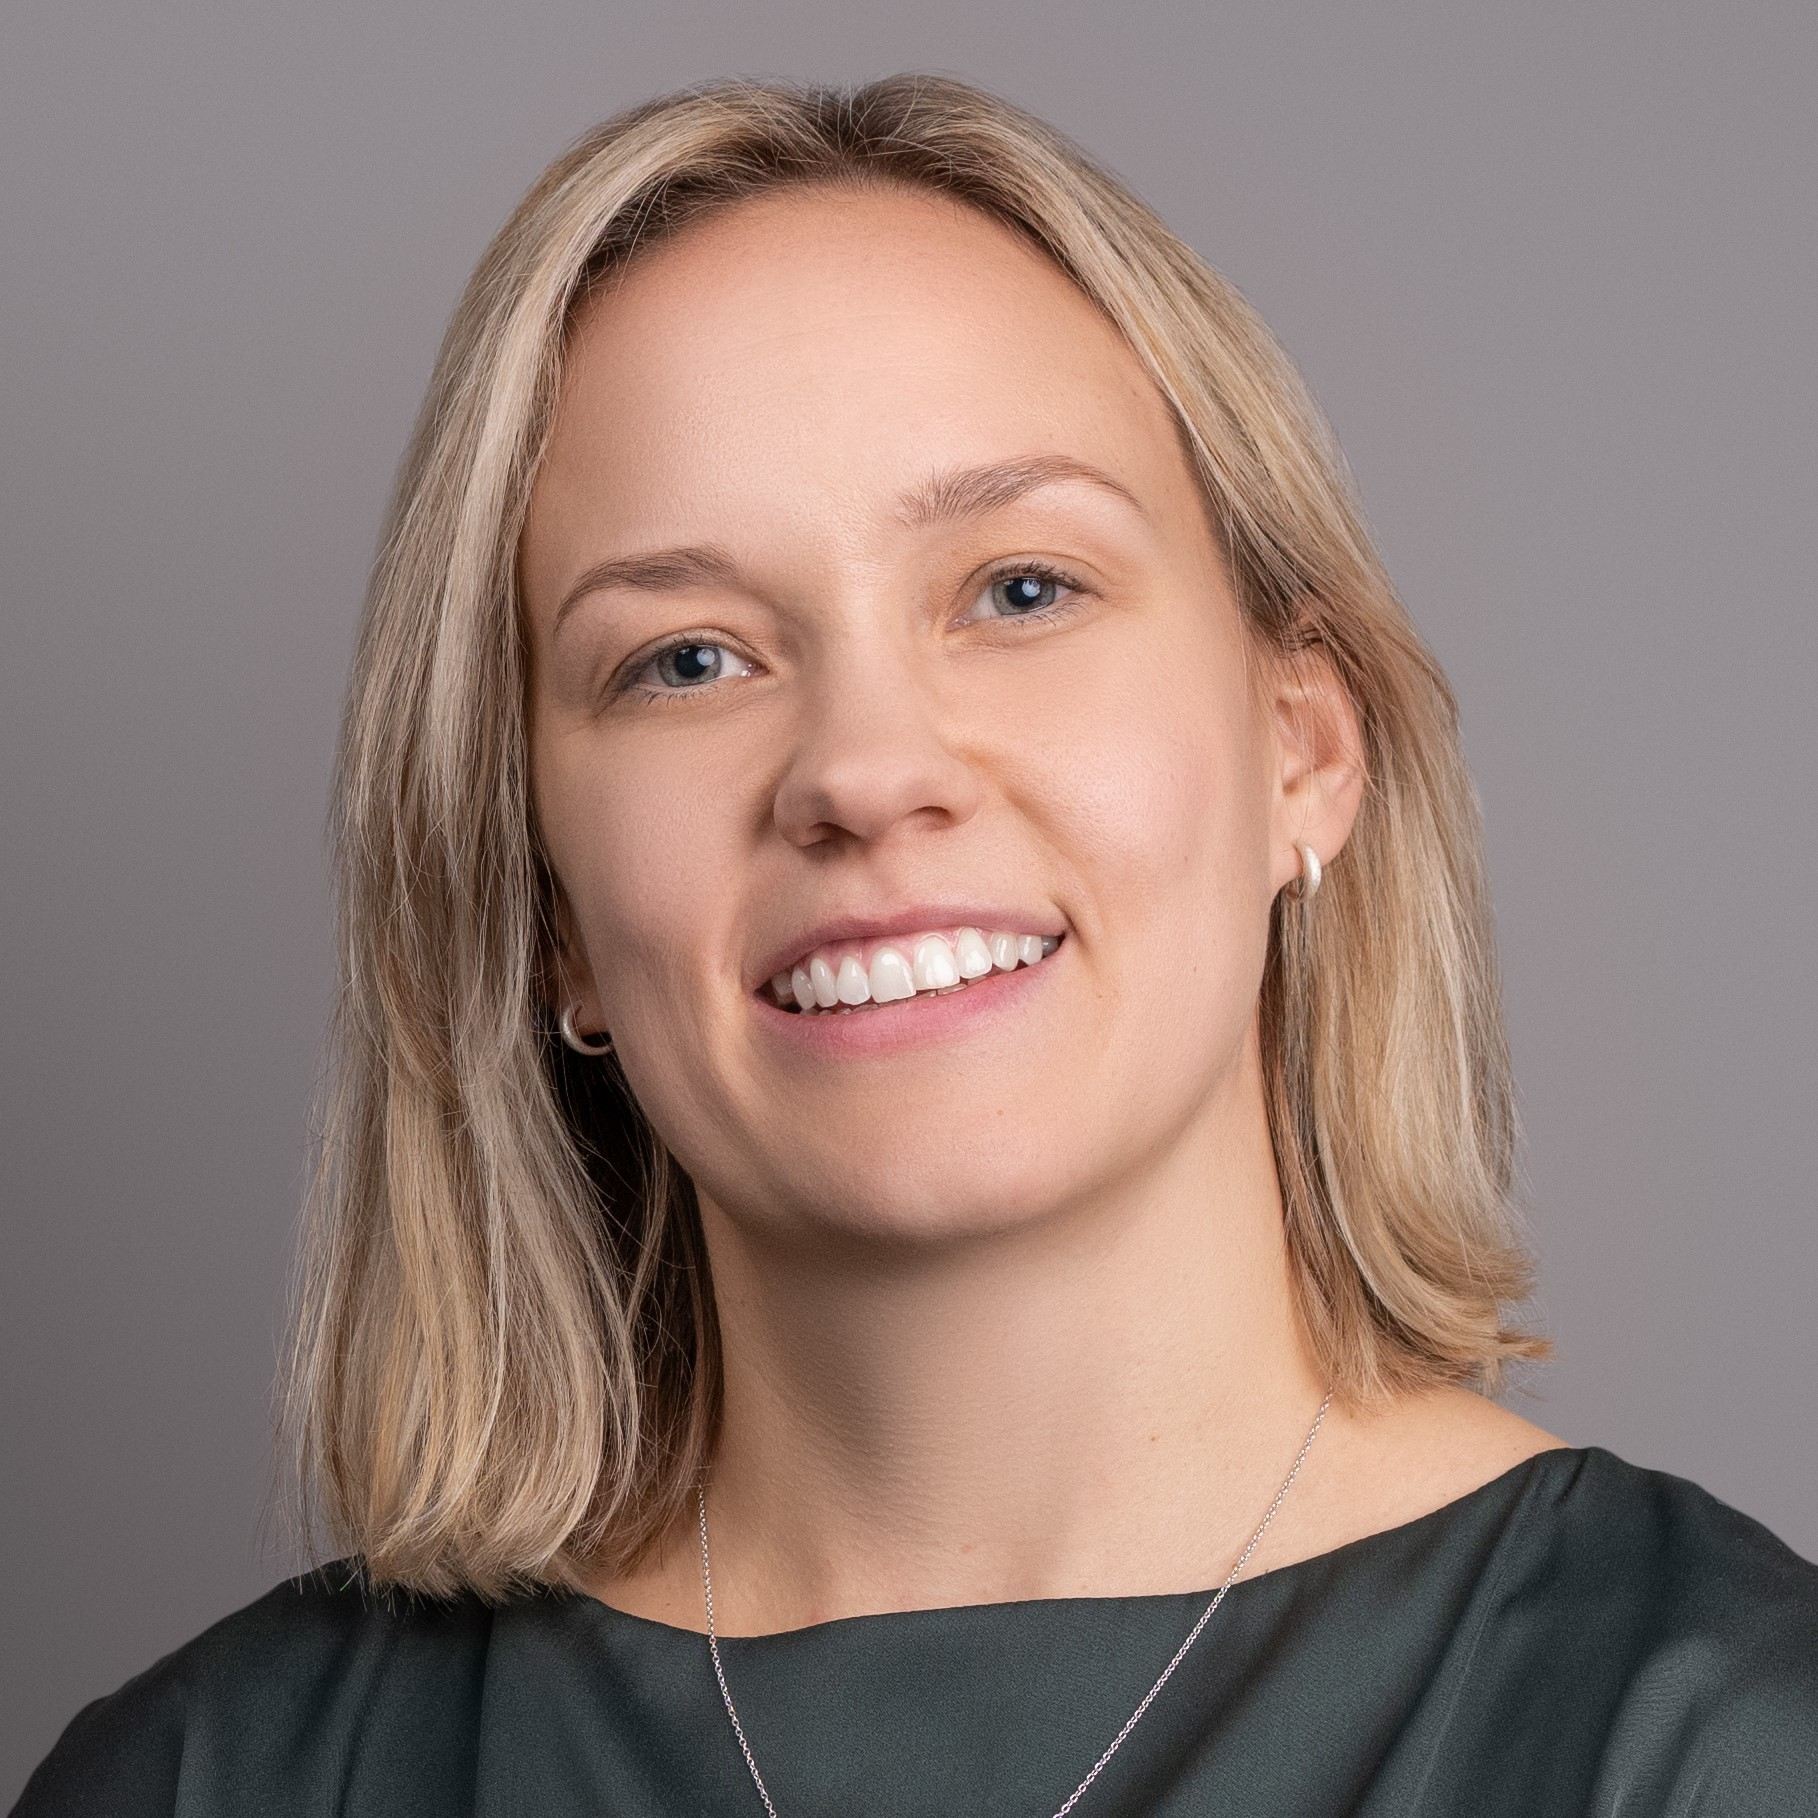 Photo of Hanna Eiderbrant